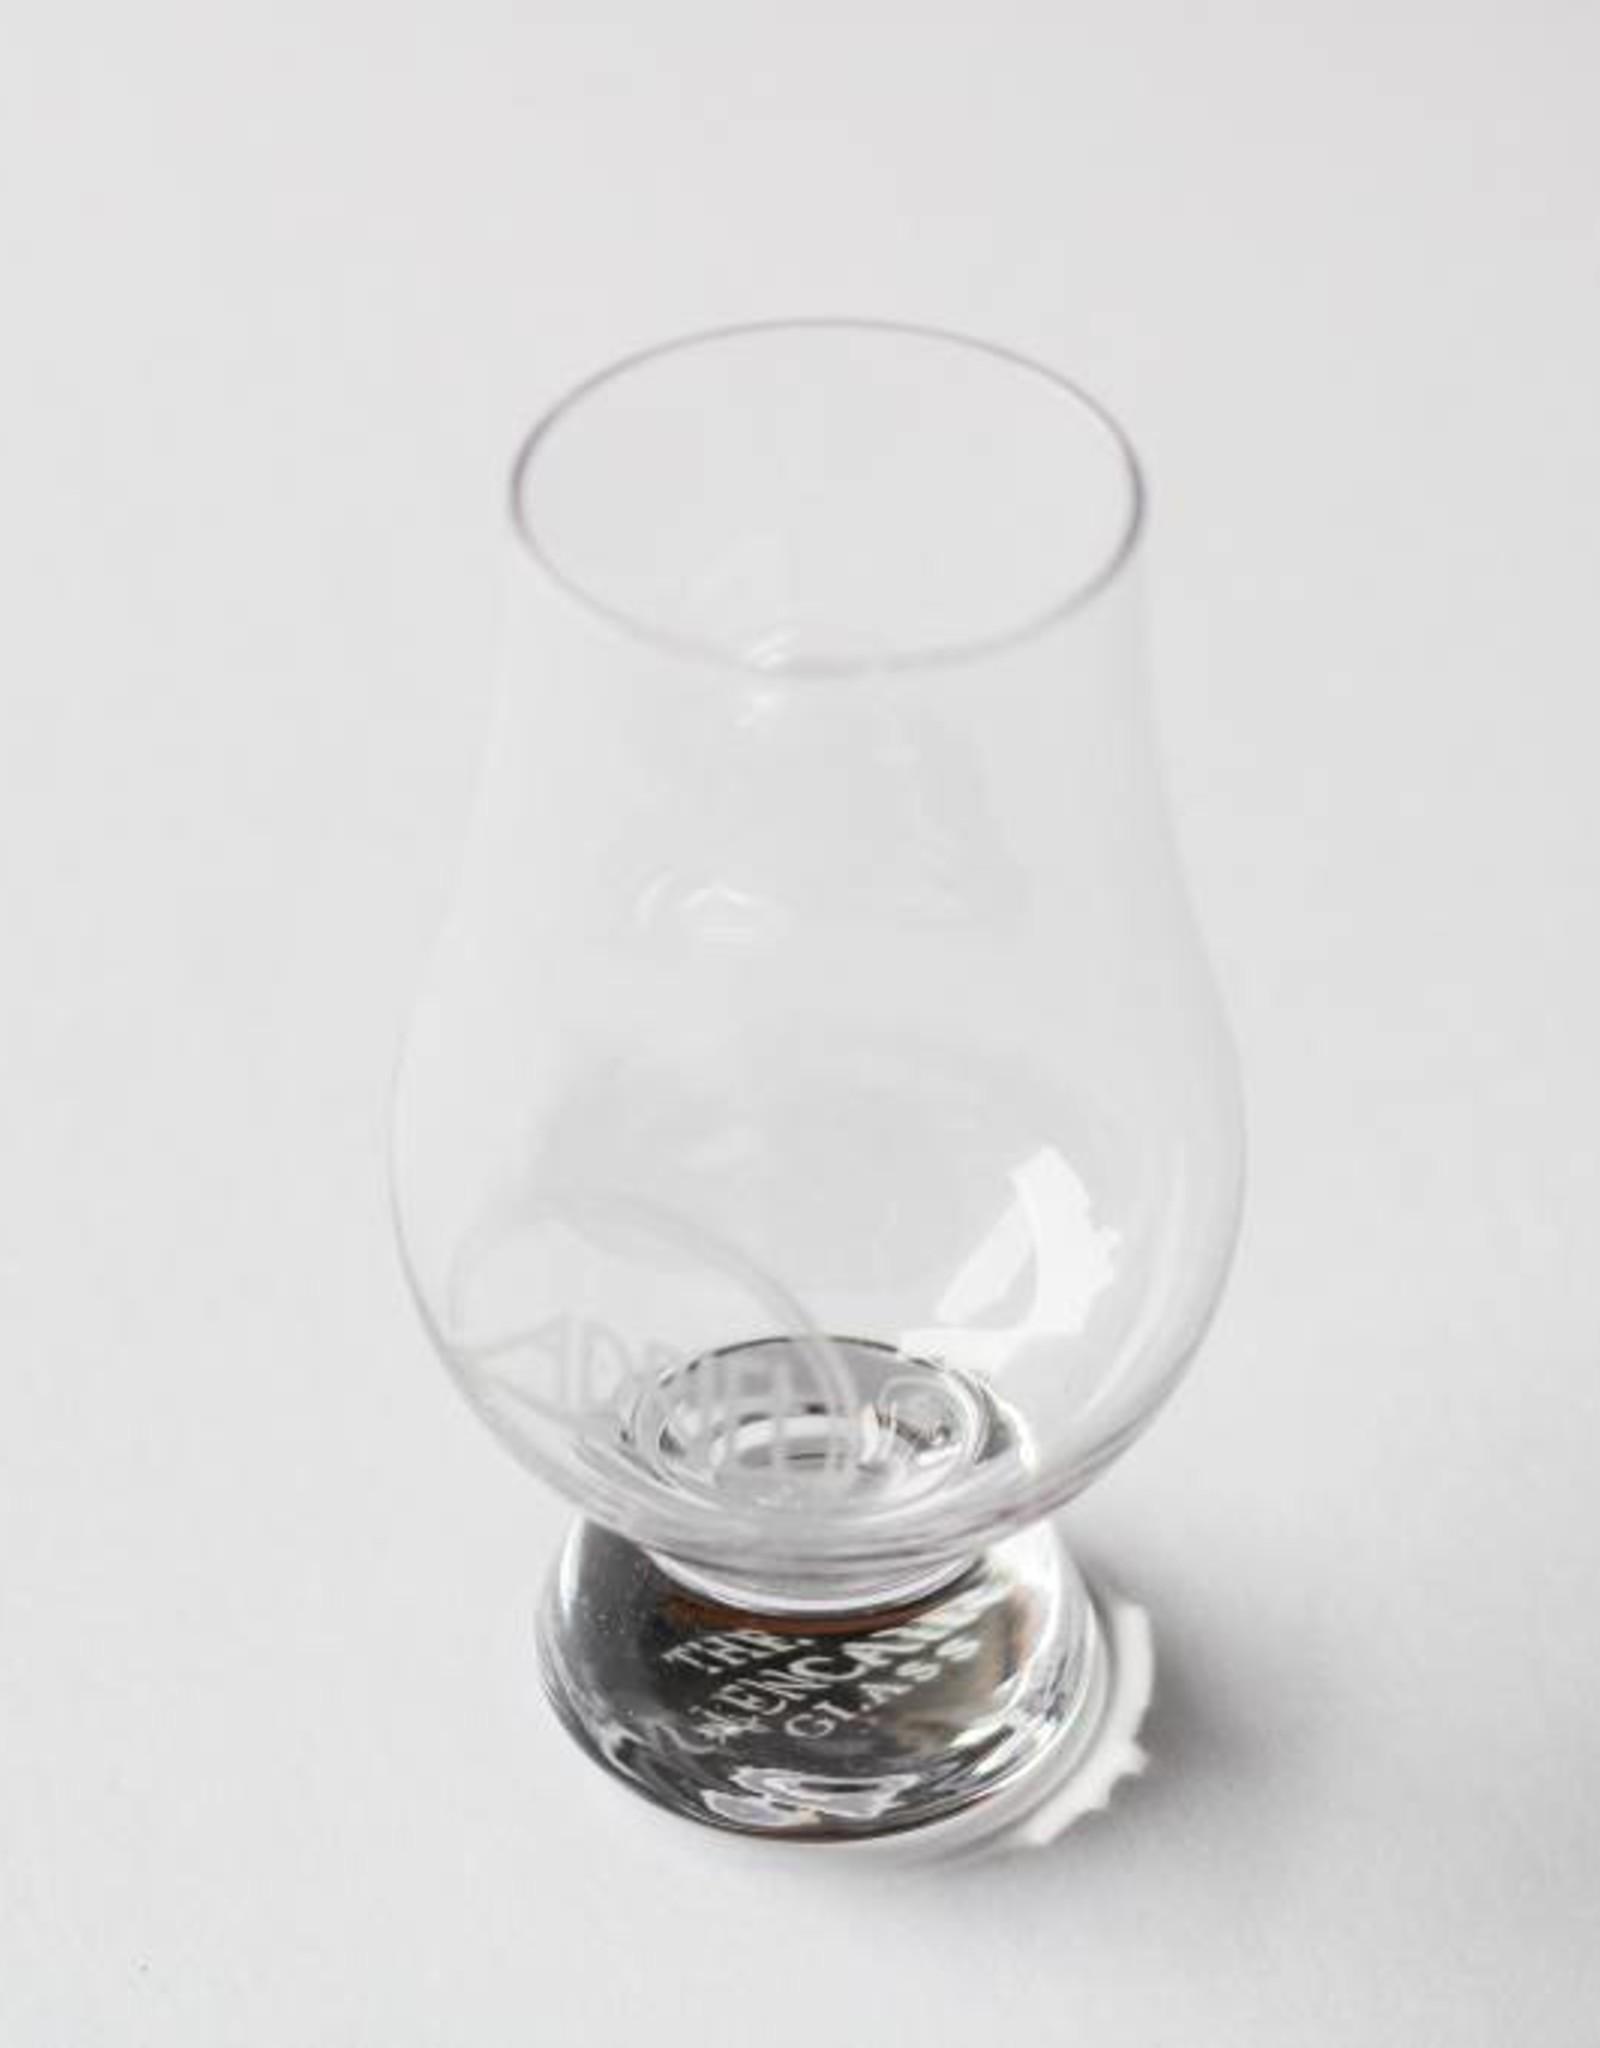 Adrift Distillers Etched Glencairn Glass